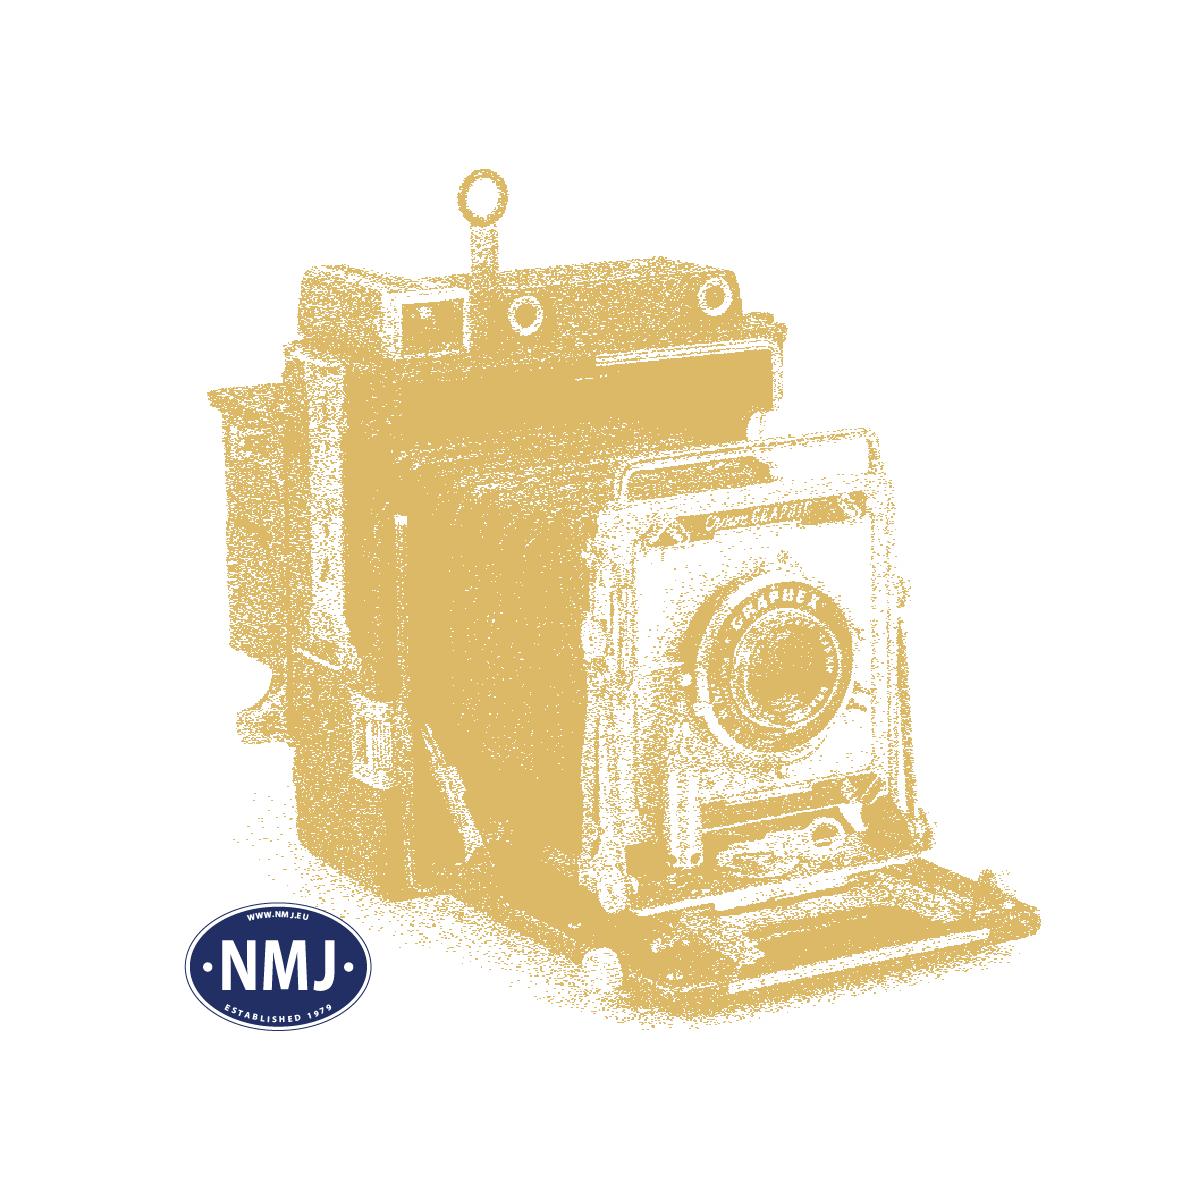 NMJT402.103 - MAV-Start CAF Perseonvogn Amz  61 55 19-91 105-6